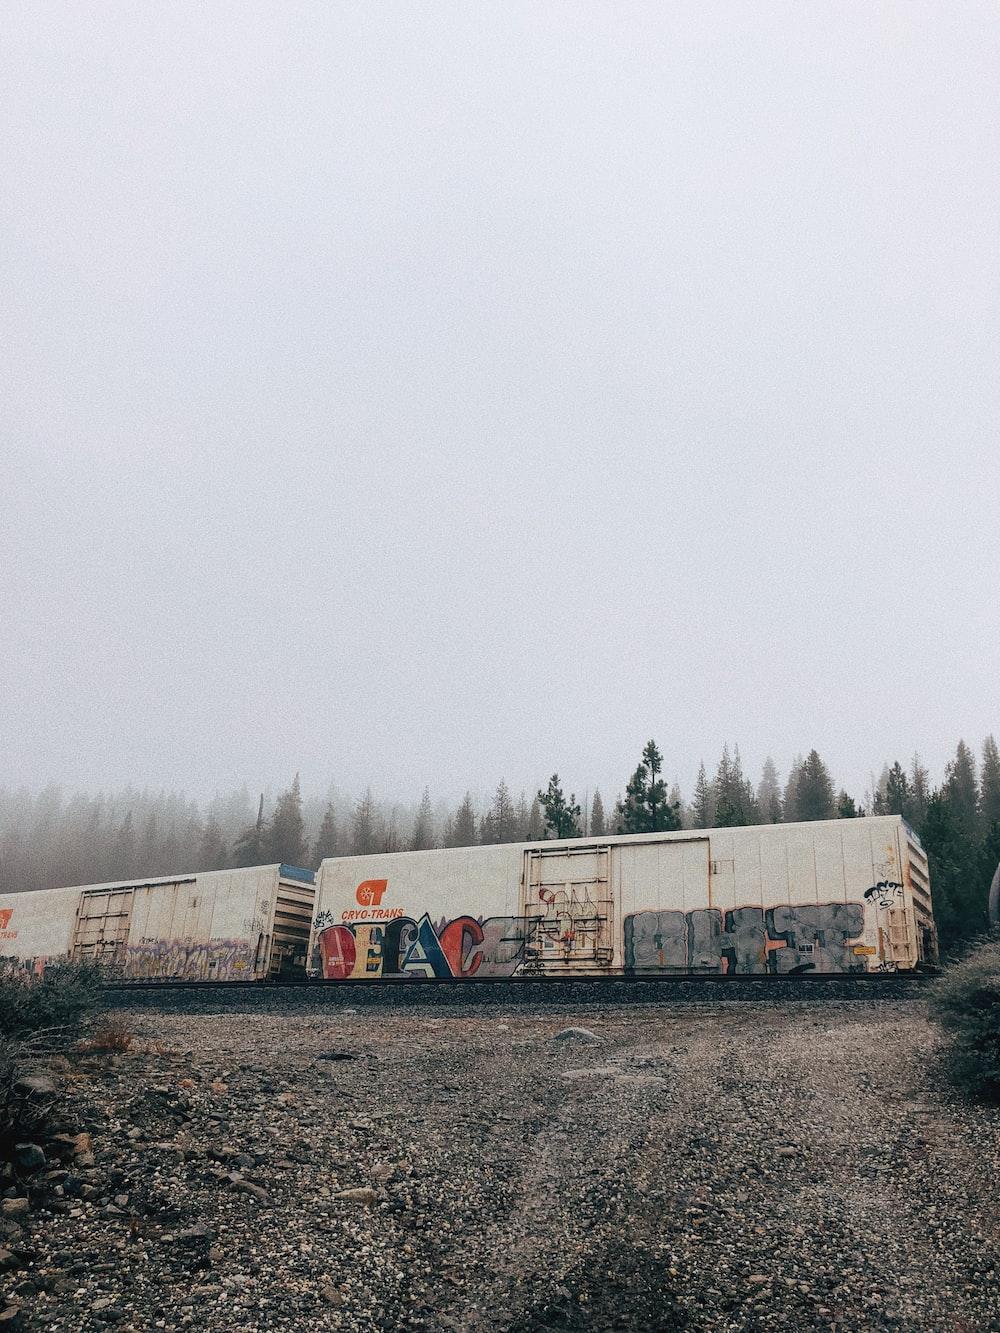 white and black train cars with graffiti